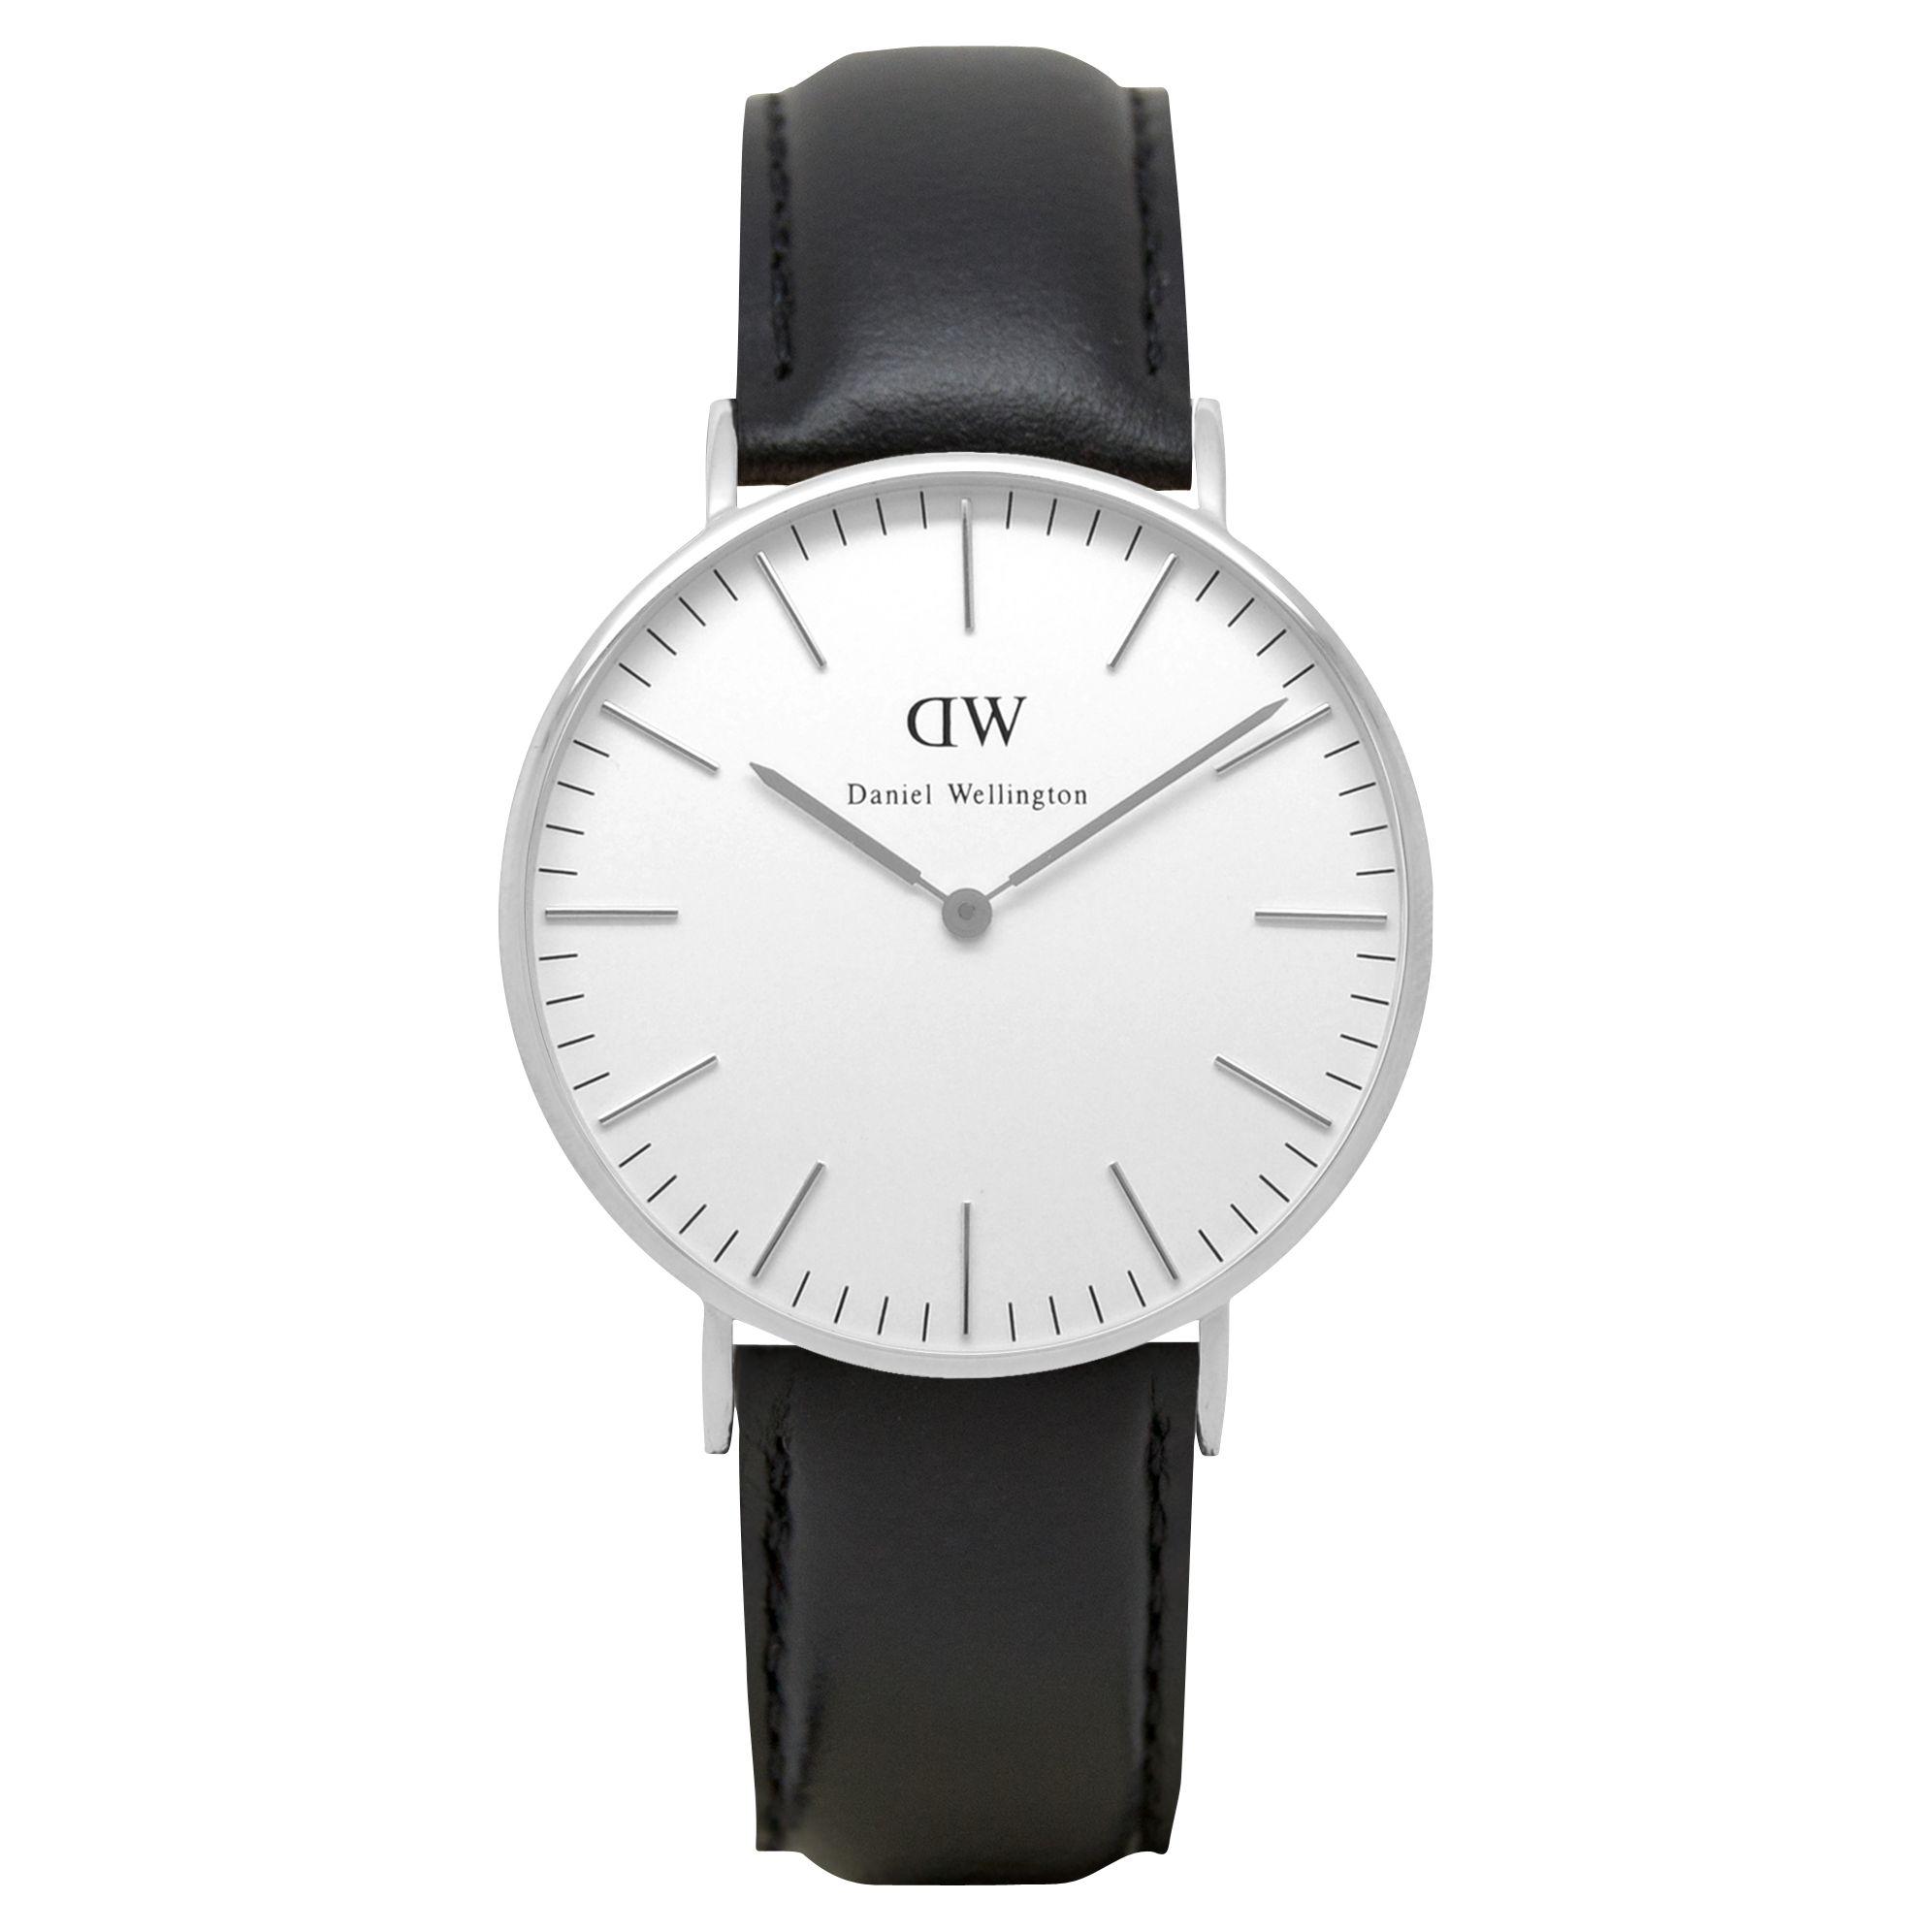 Daniel Wellington Daniel Wellington 0608DW Women's Vintage Leather Strap Watch, Black/White